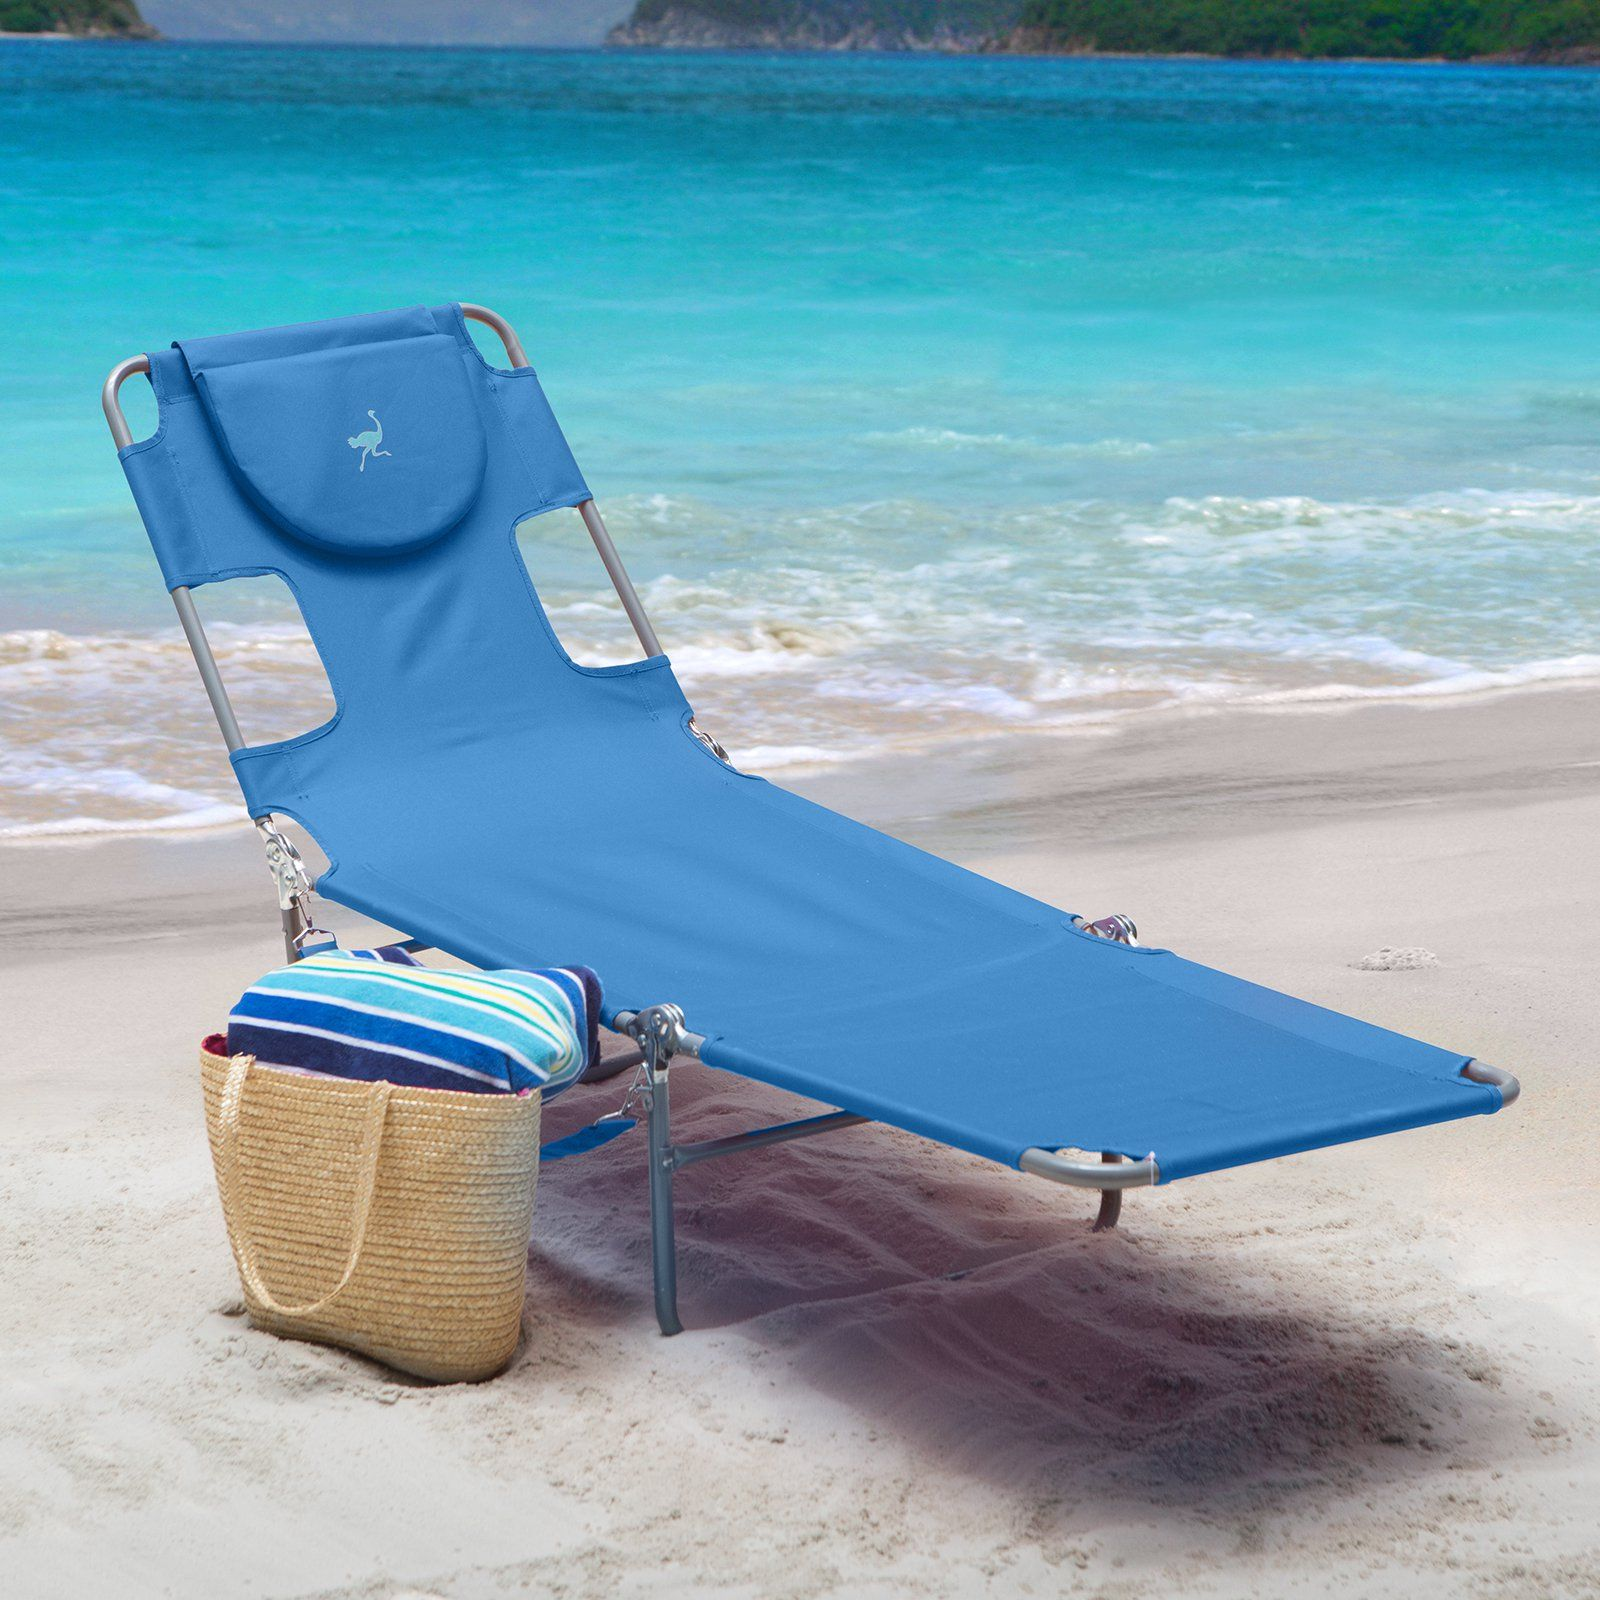 Superbe Outdoor Beach Chair: Ostrich Folding Lounge Chair   MP2 FOLDING CHAISE